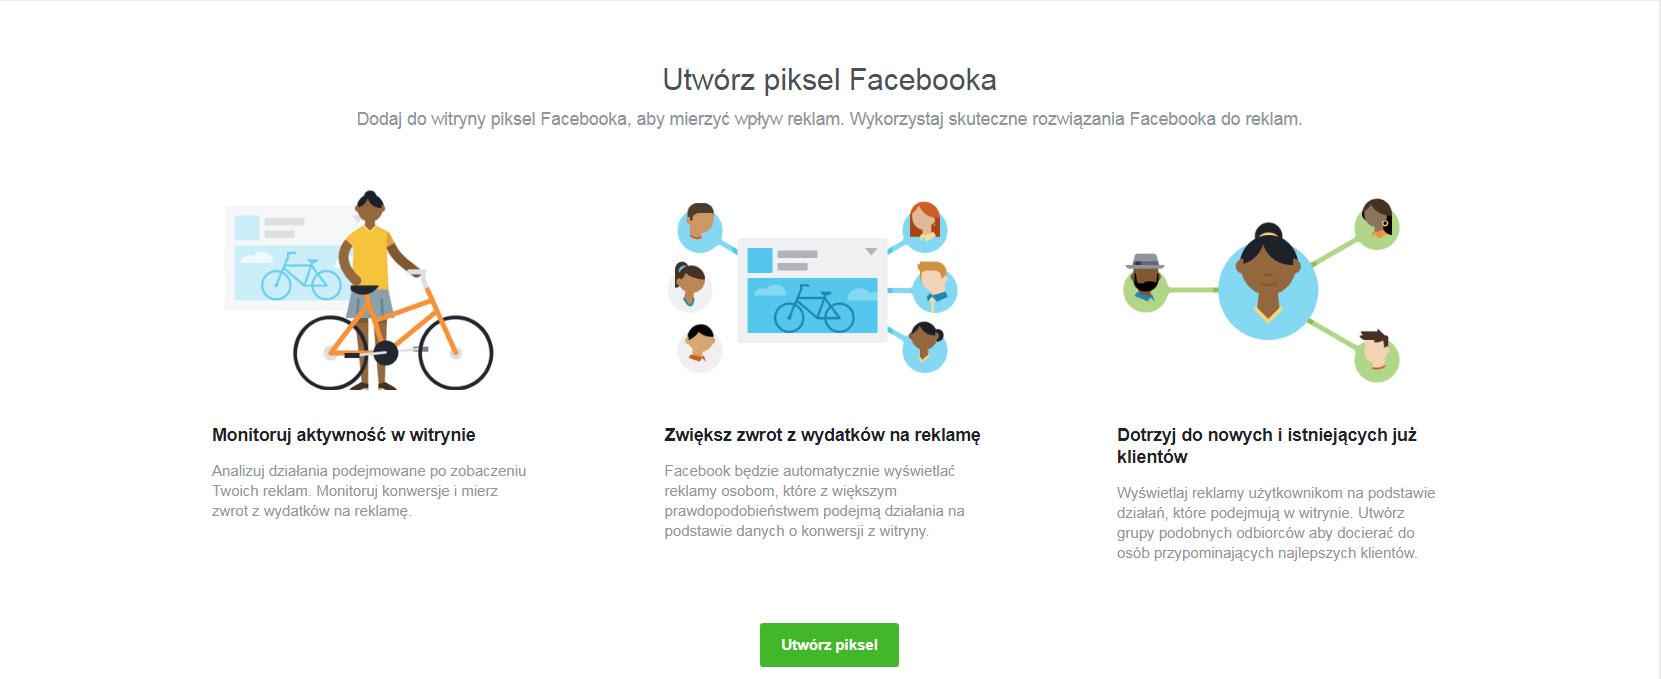 Piksel facebooka - krok 2